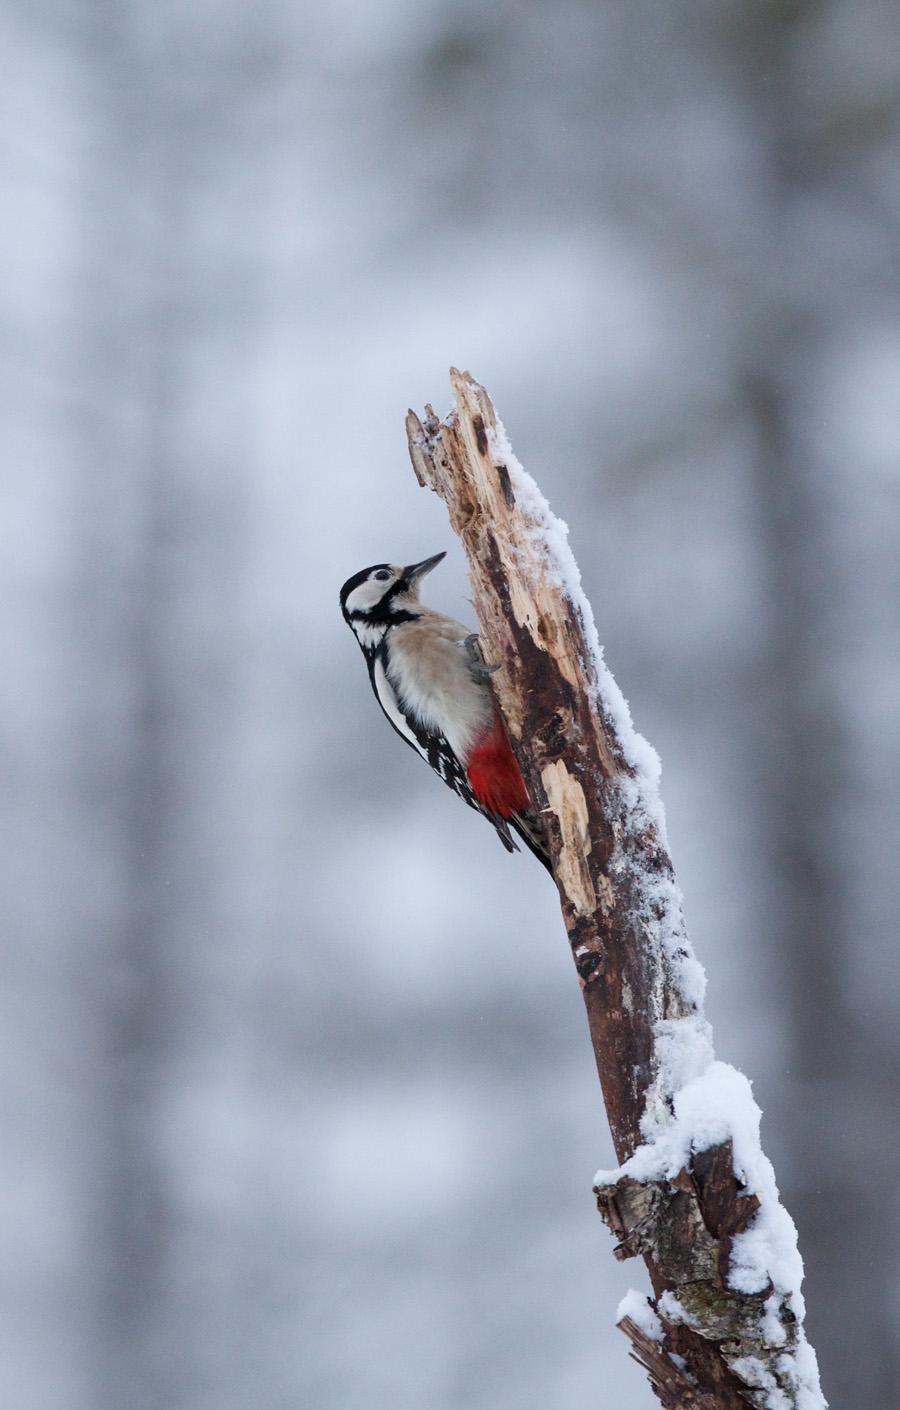 Suur-kirjurähn, Dendrocopos major, Great Spotted Woodpecker